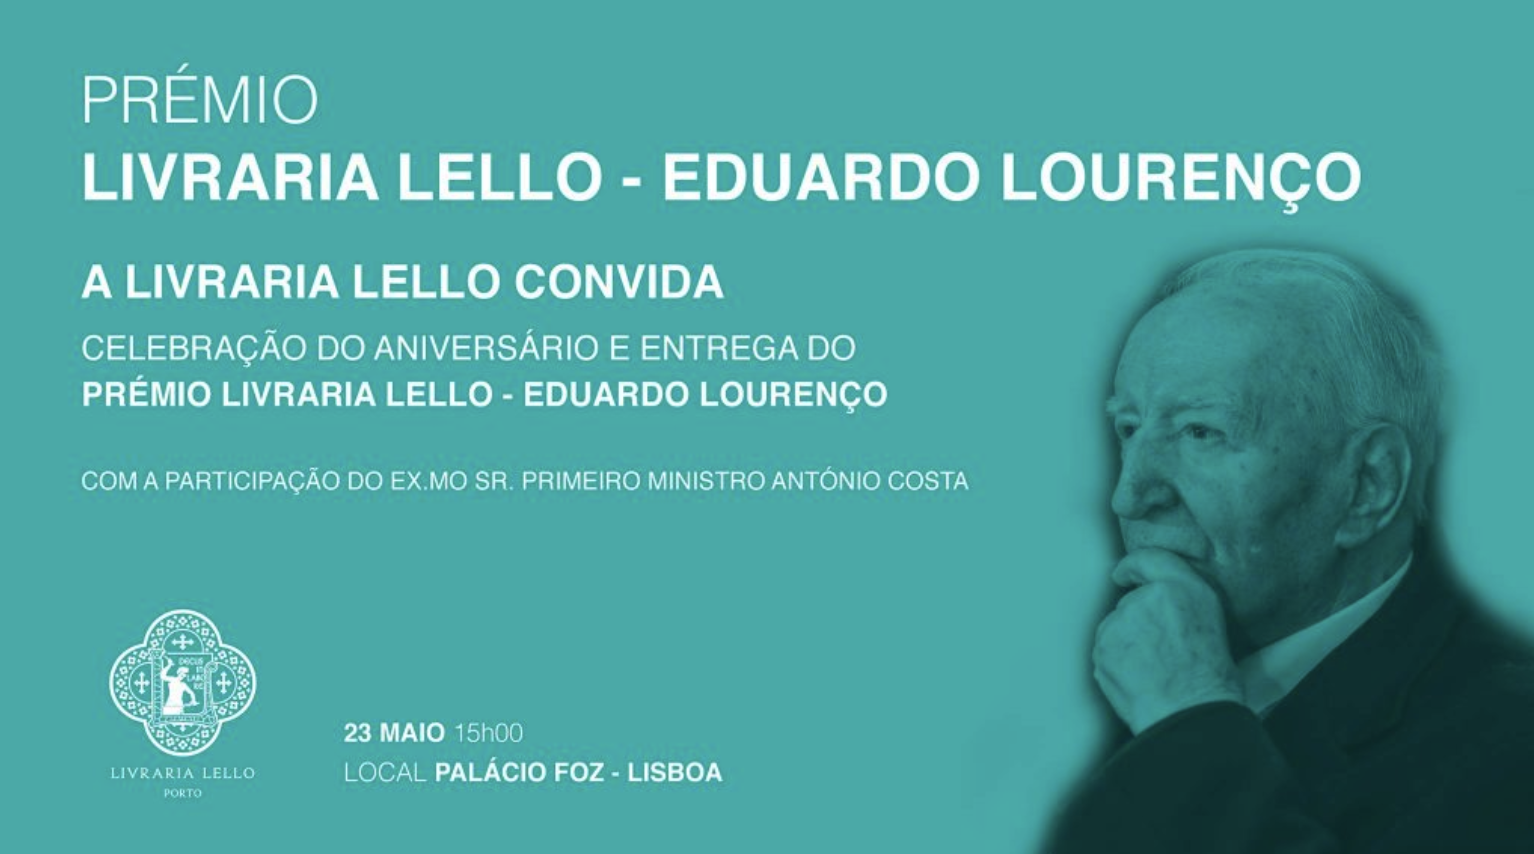 Entrega do prémio Livraria Lello a Eduardo Lourenço